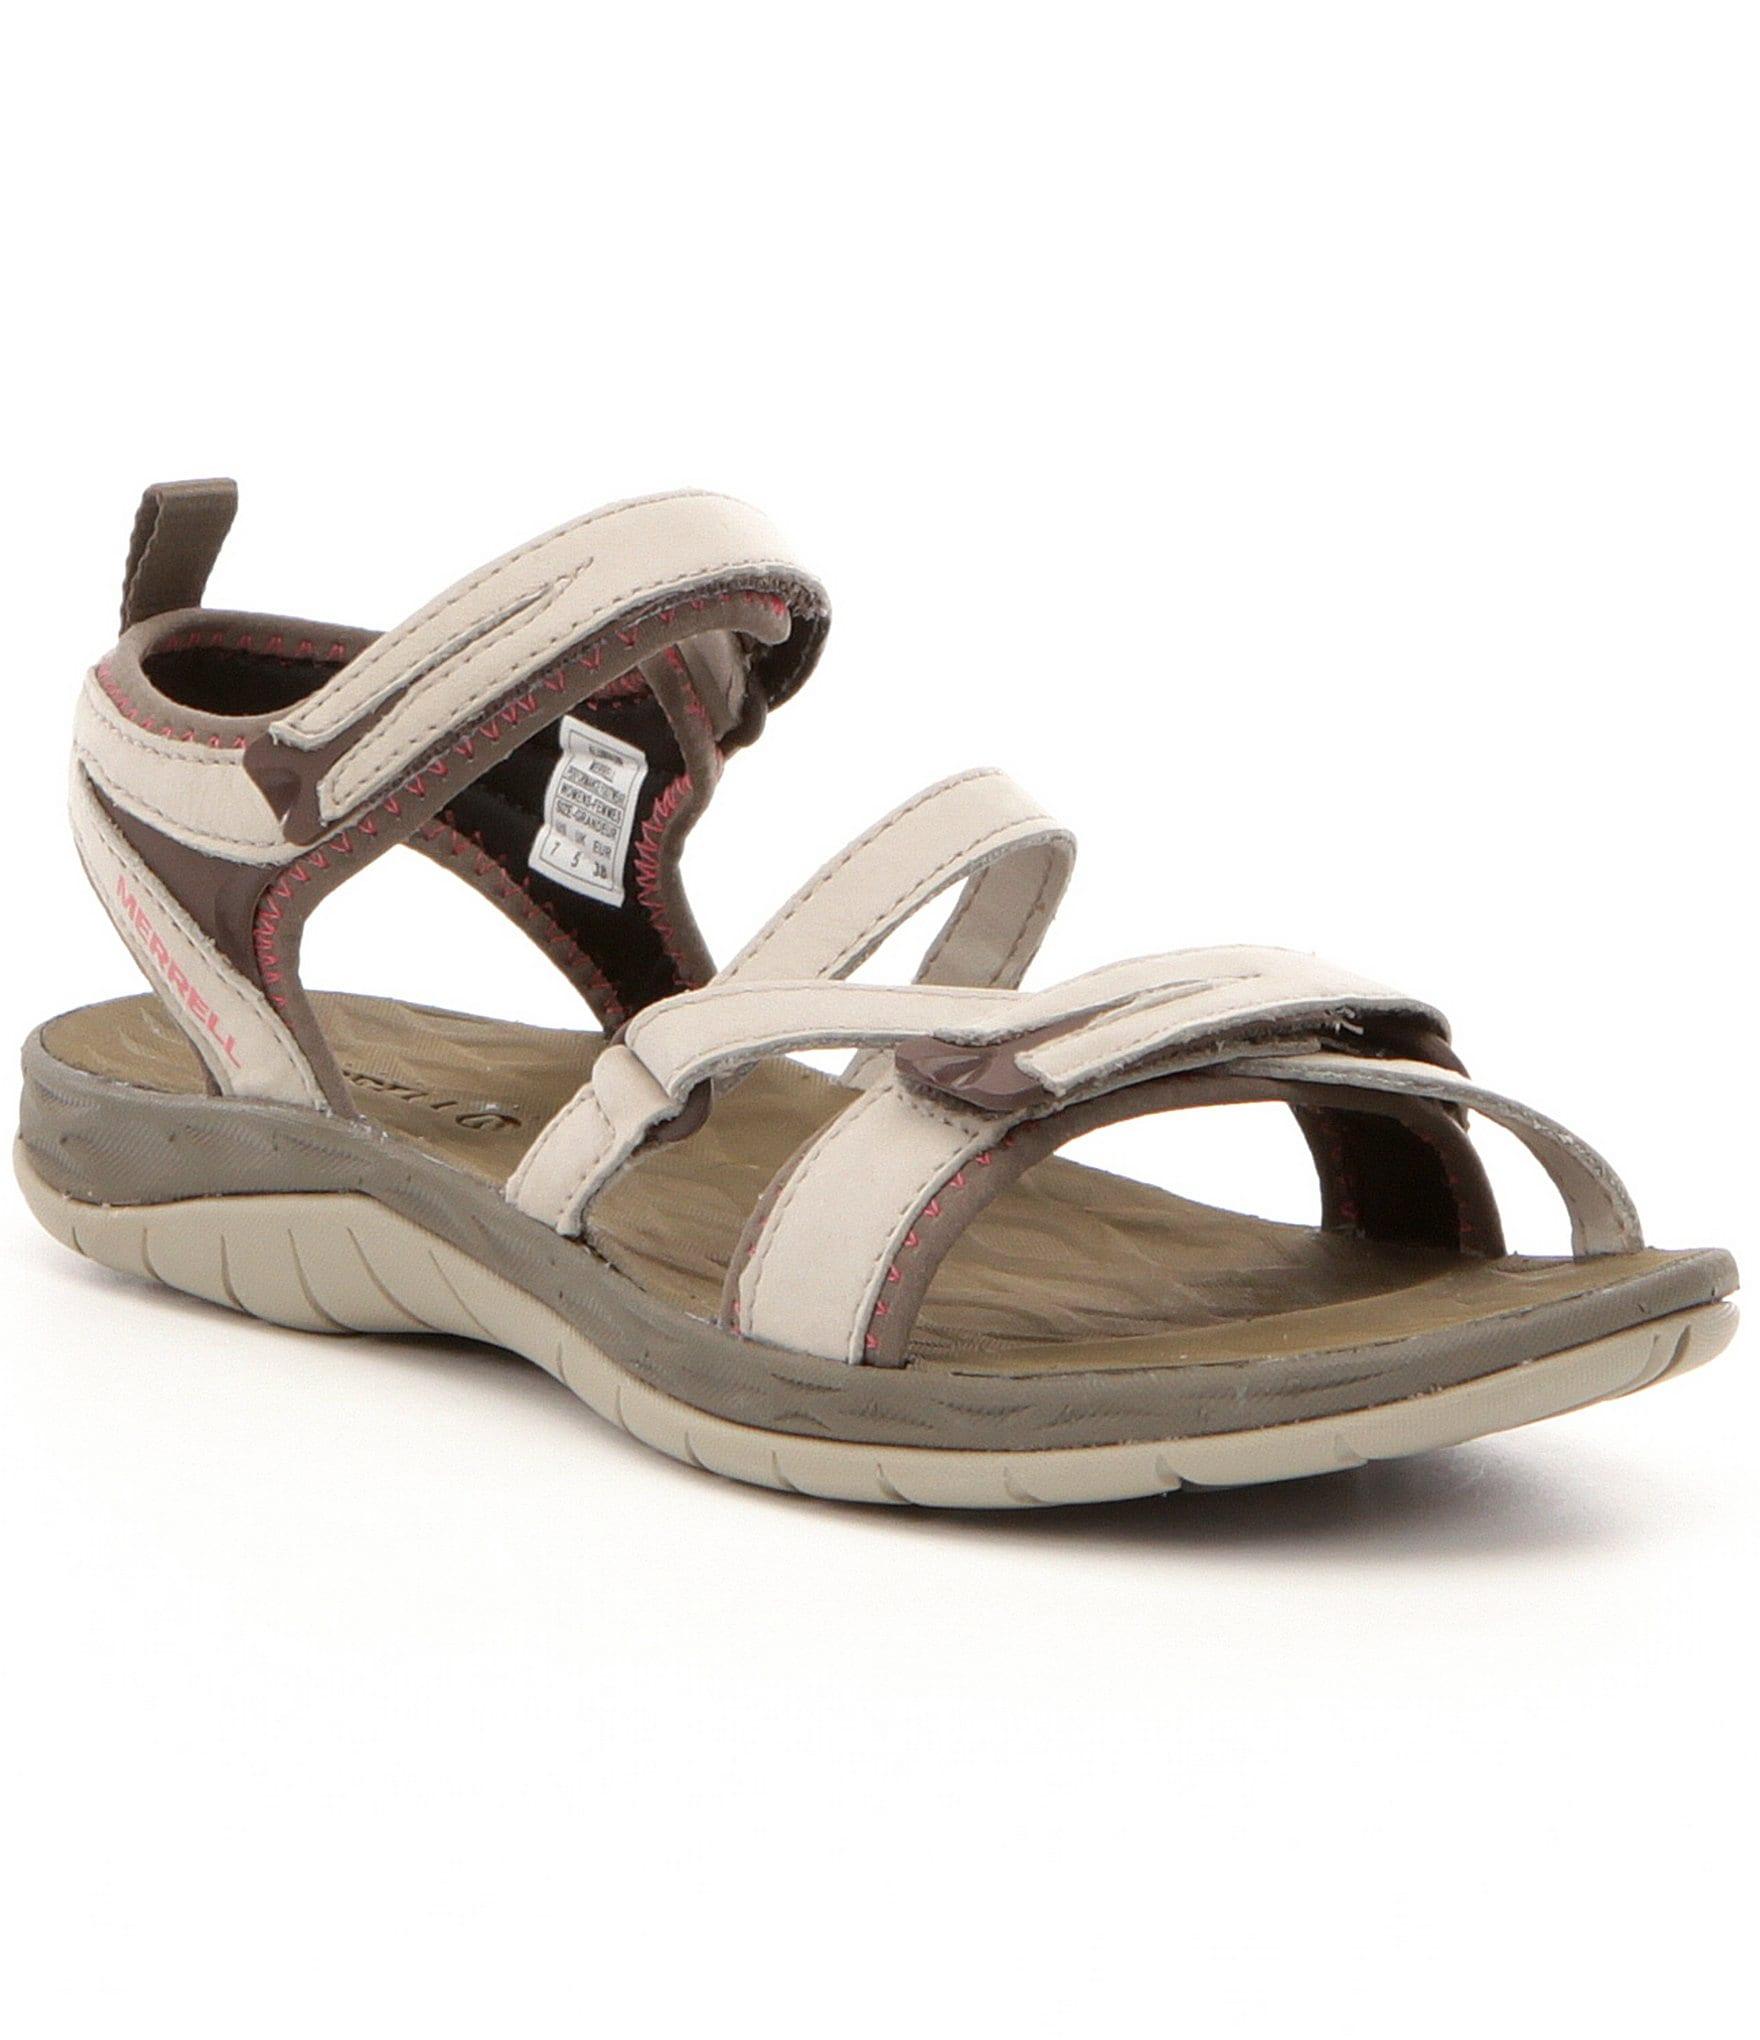 Merrell Women S Siren Strap Q2 Sandals Dillards